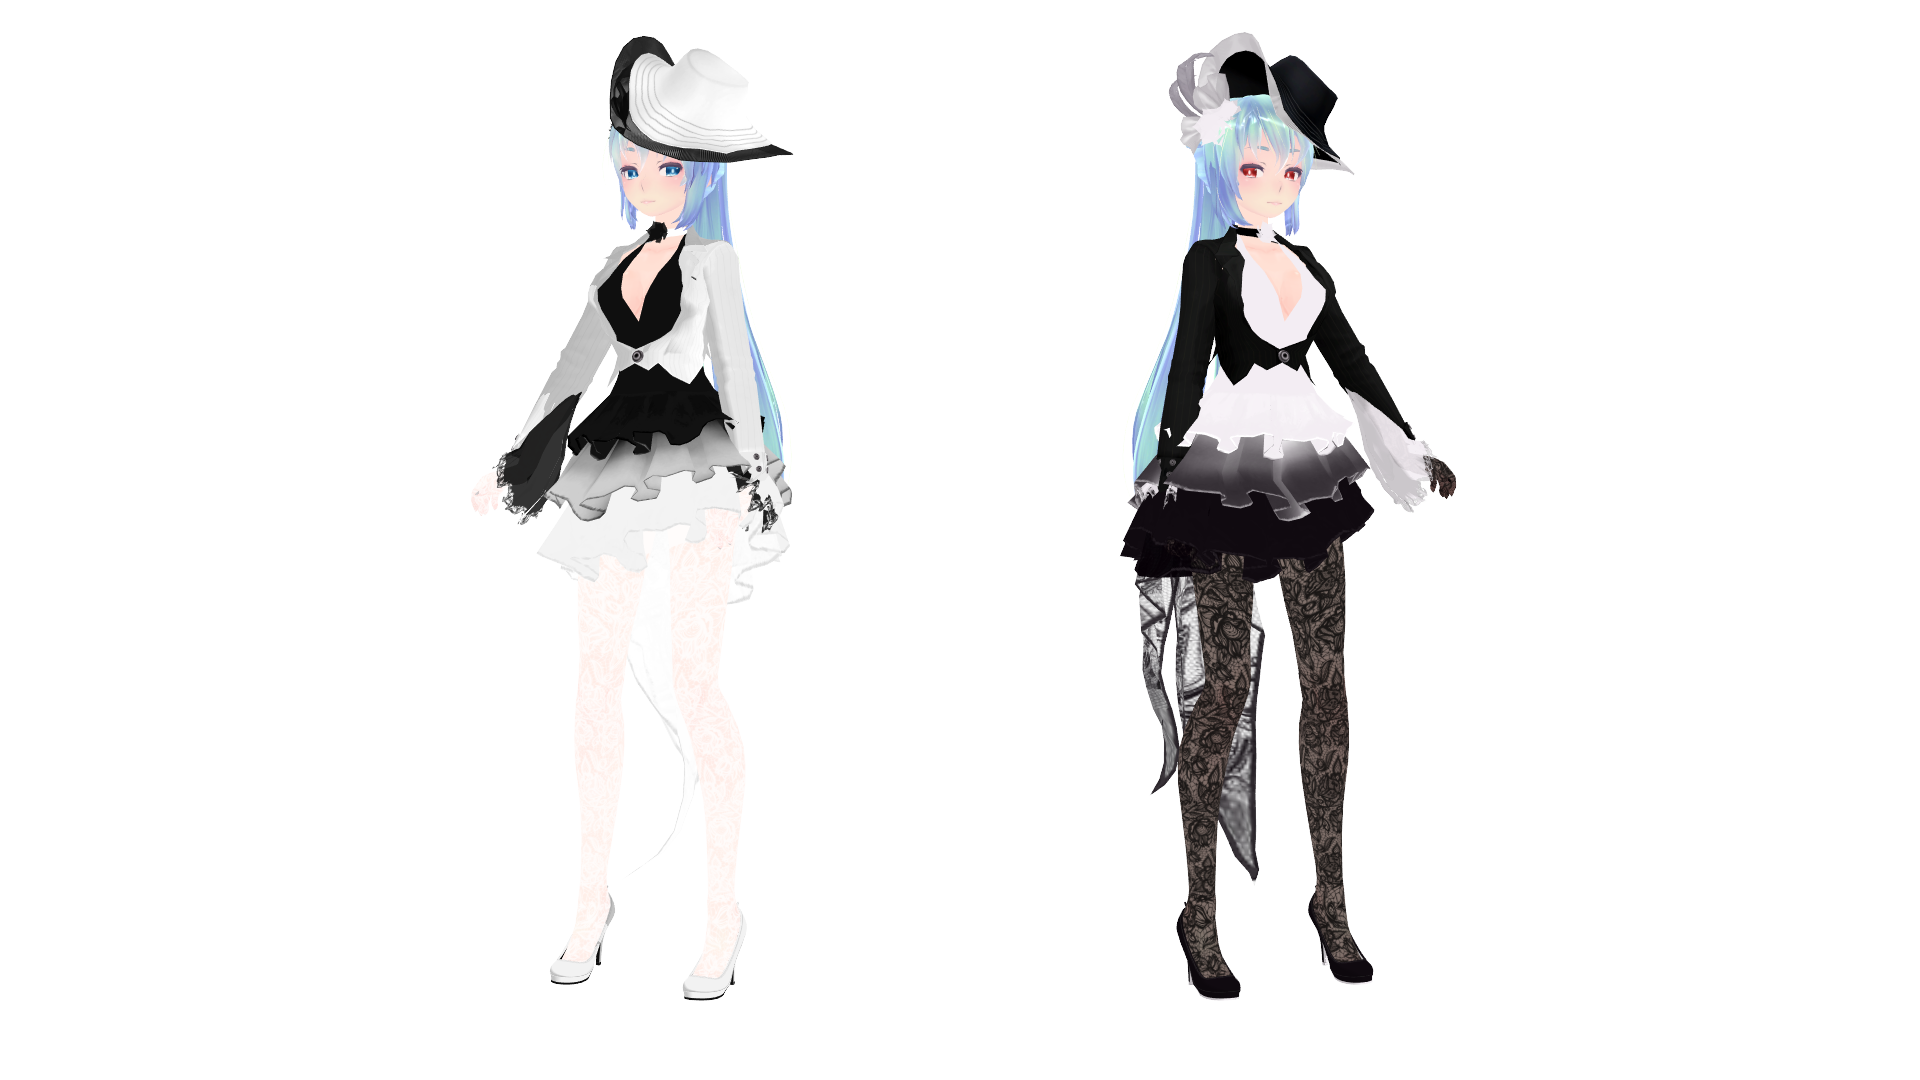 Mmd Model Dl Tda White And Black Rose Miku By Mizukinoru1310 On Deviantart